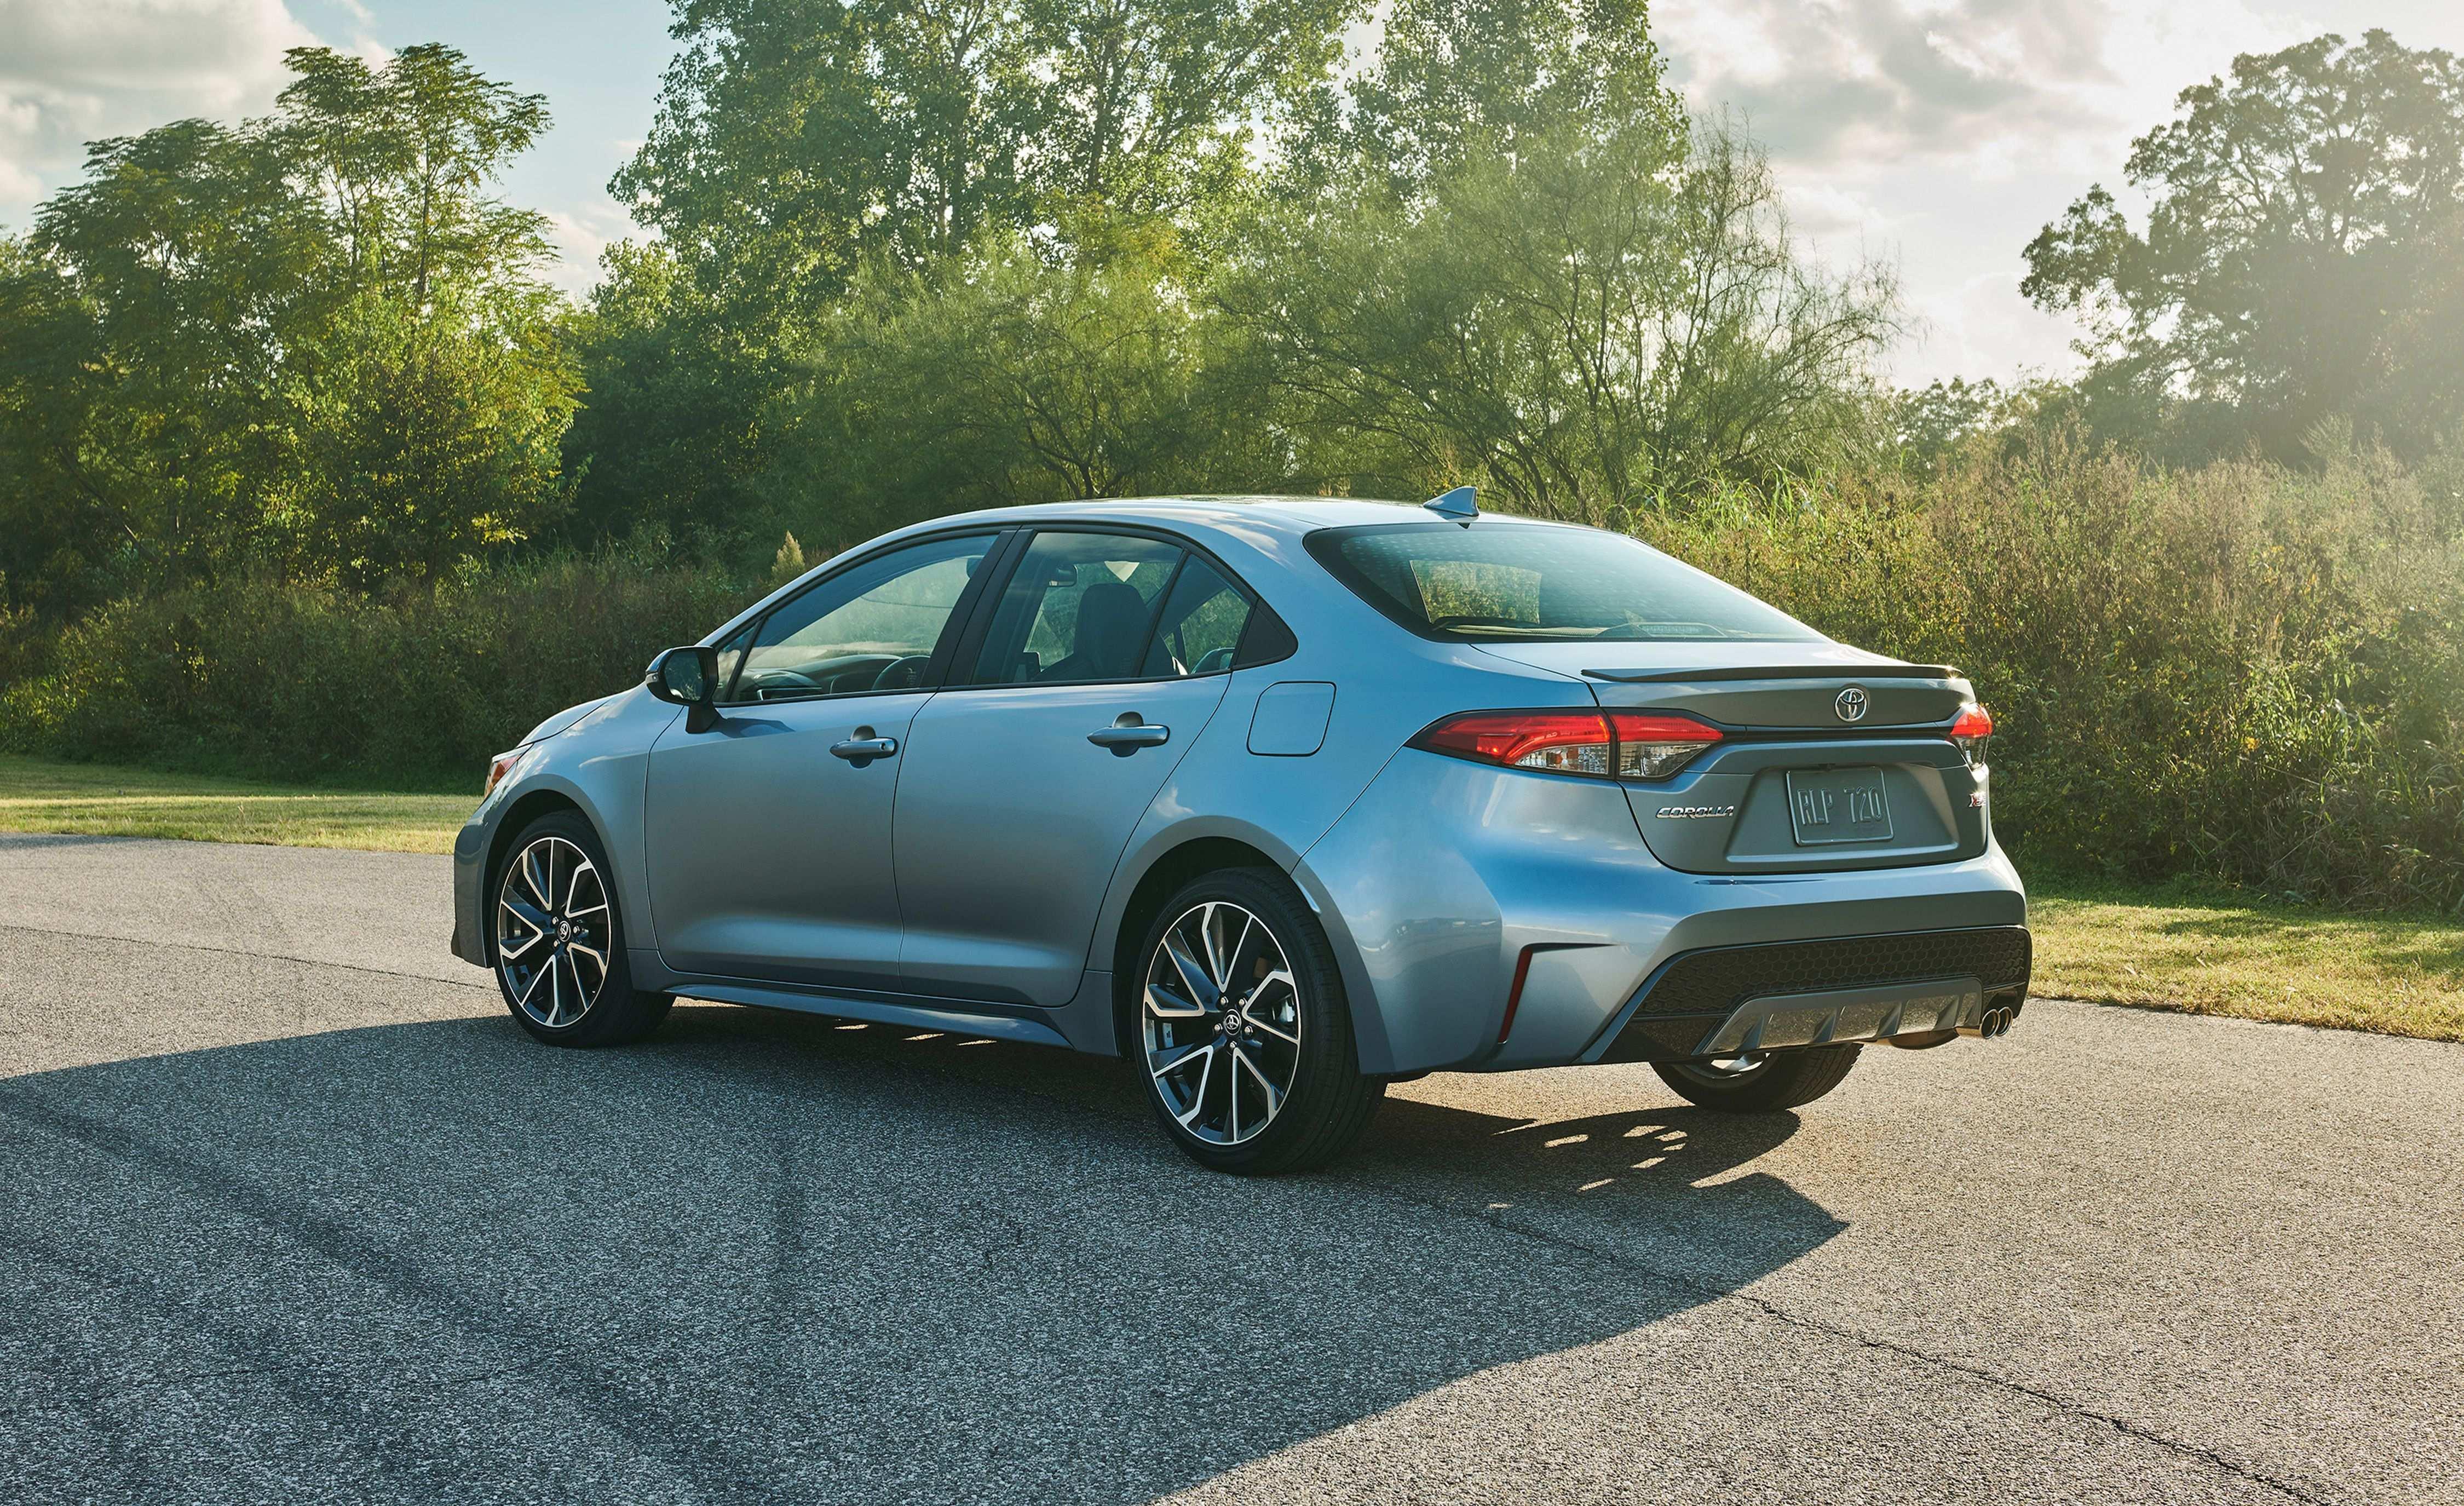 16 New Toyota 2020 Se Performance by Toyota 2020 Se